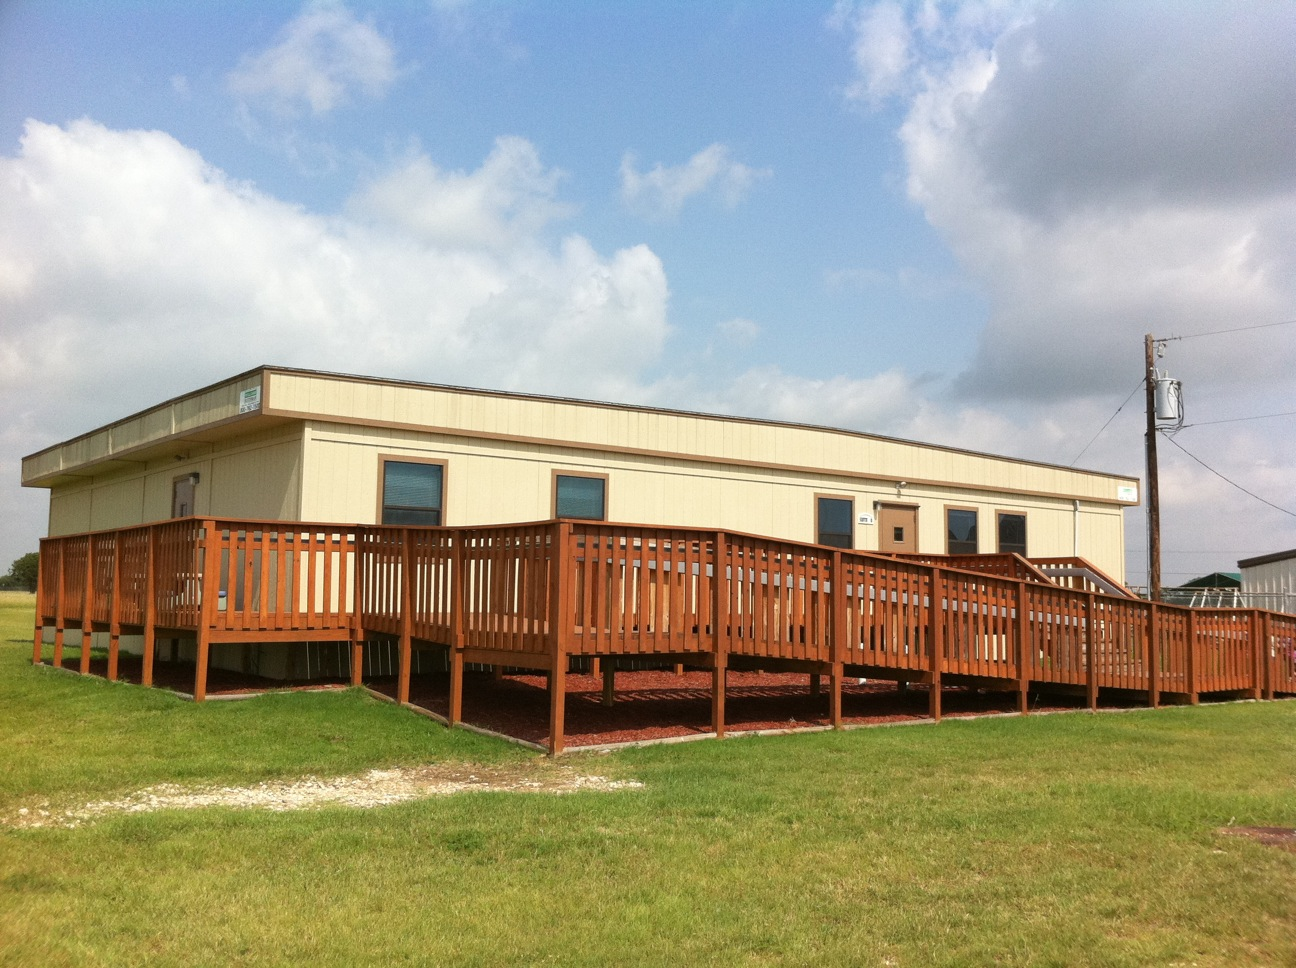 Used Modular Daycare Building For Sale - Texas - iModular ...